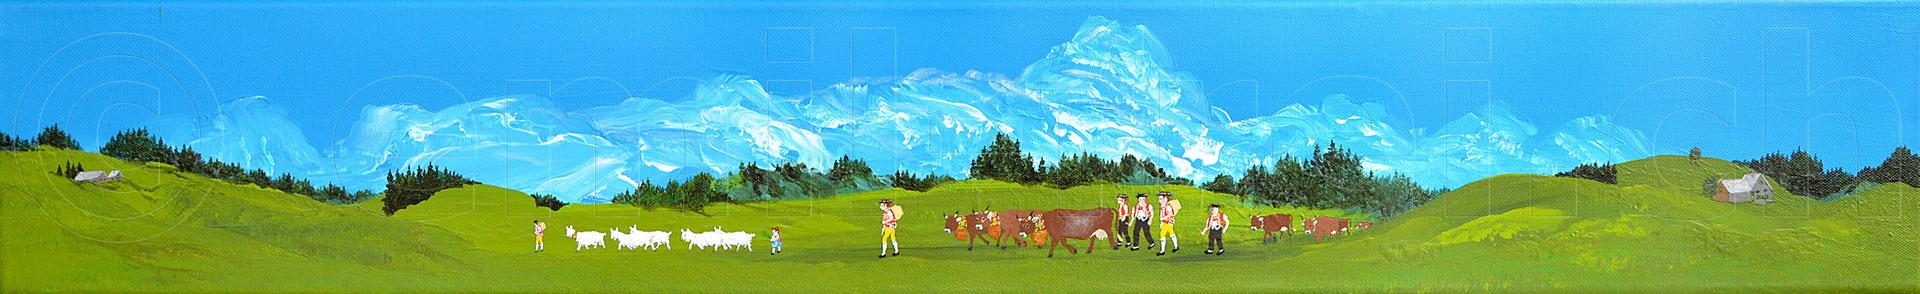 15 x 100 cm, Acryl auf Leinwand, 2016